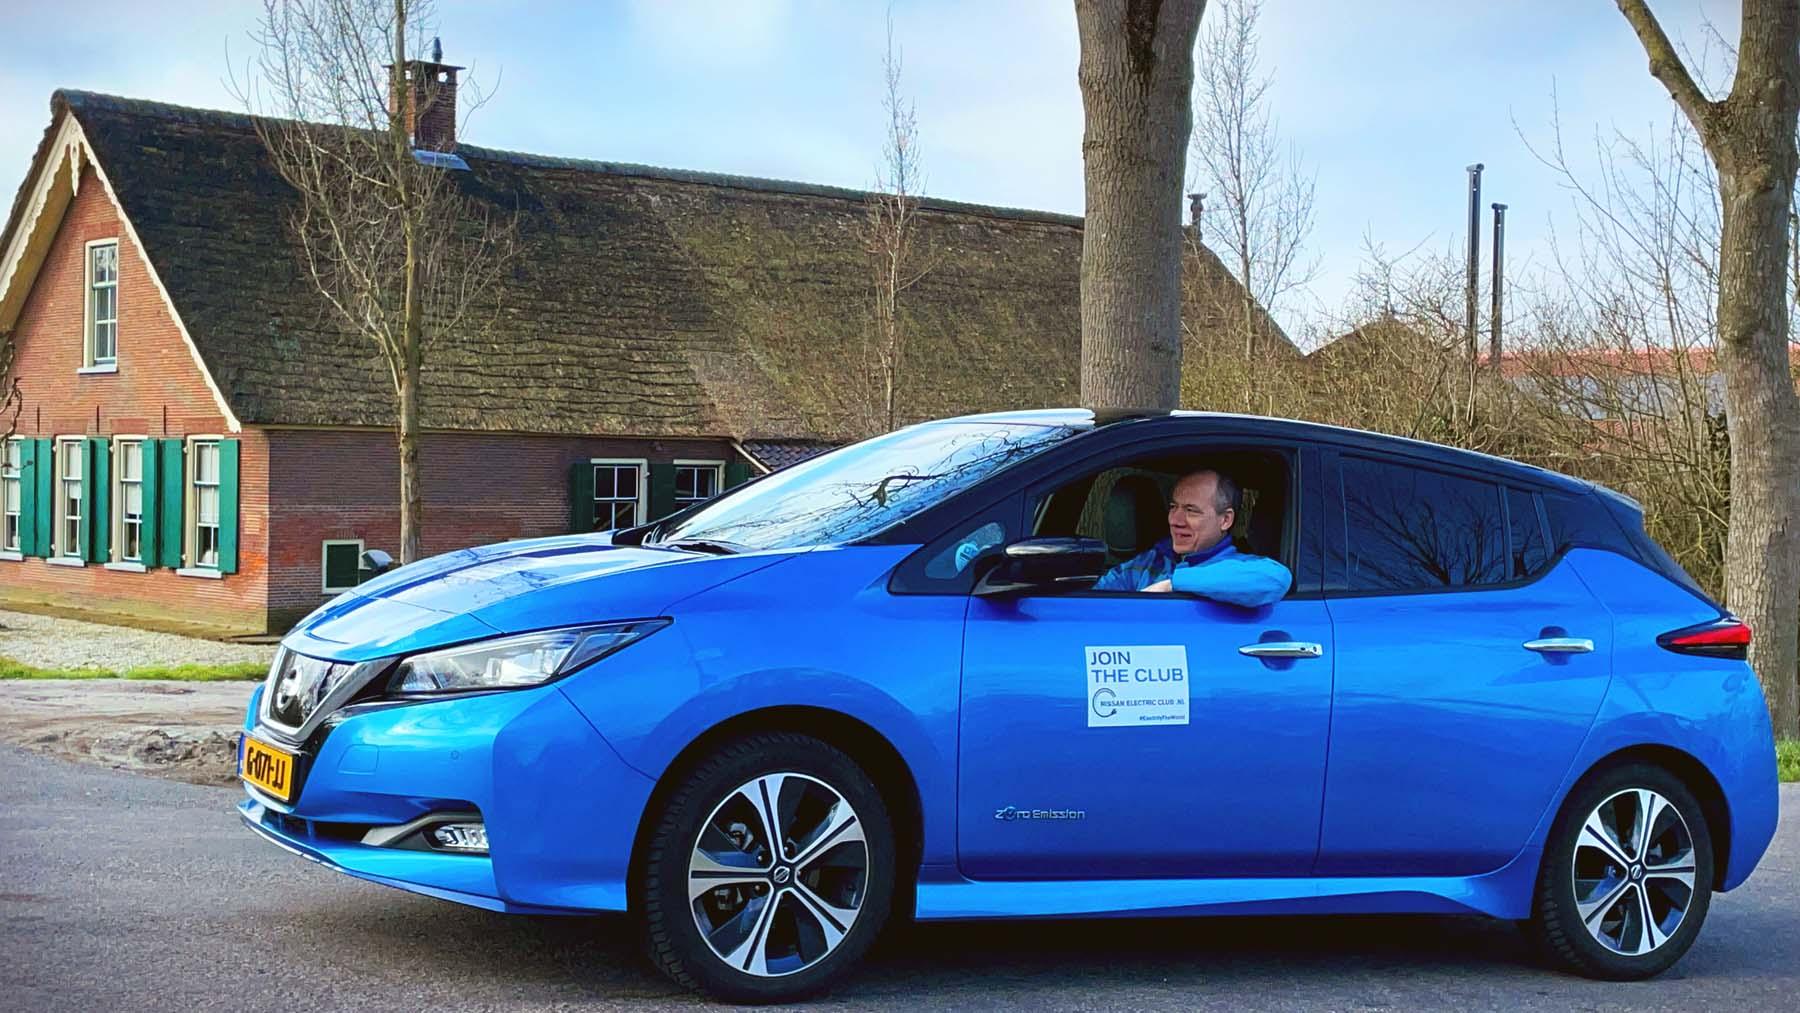 Picture1 Οι Ευρωπαίοι οδηγοί EVs ταξιδεύουν περισσότερο, σύμφωνα με έρευνα της Nissan Electric cars, electric vehicles, EV, Leaf, Nissan, Nissan LEAF, ειδήσεις, ηλεκτρικά, ηλεκτροκινηση, Νέα